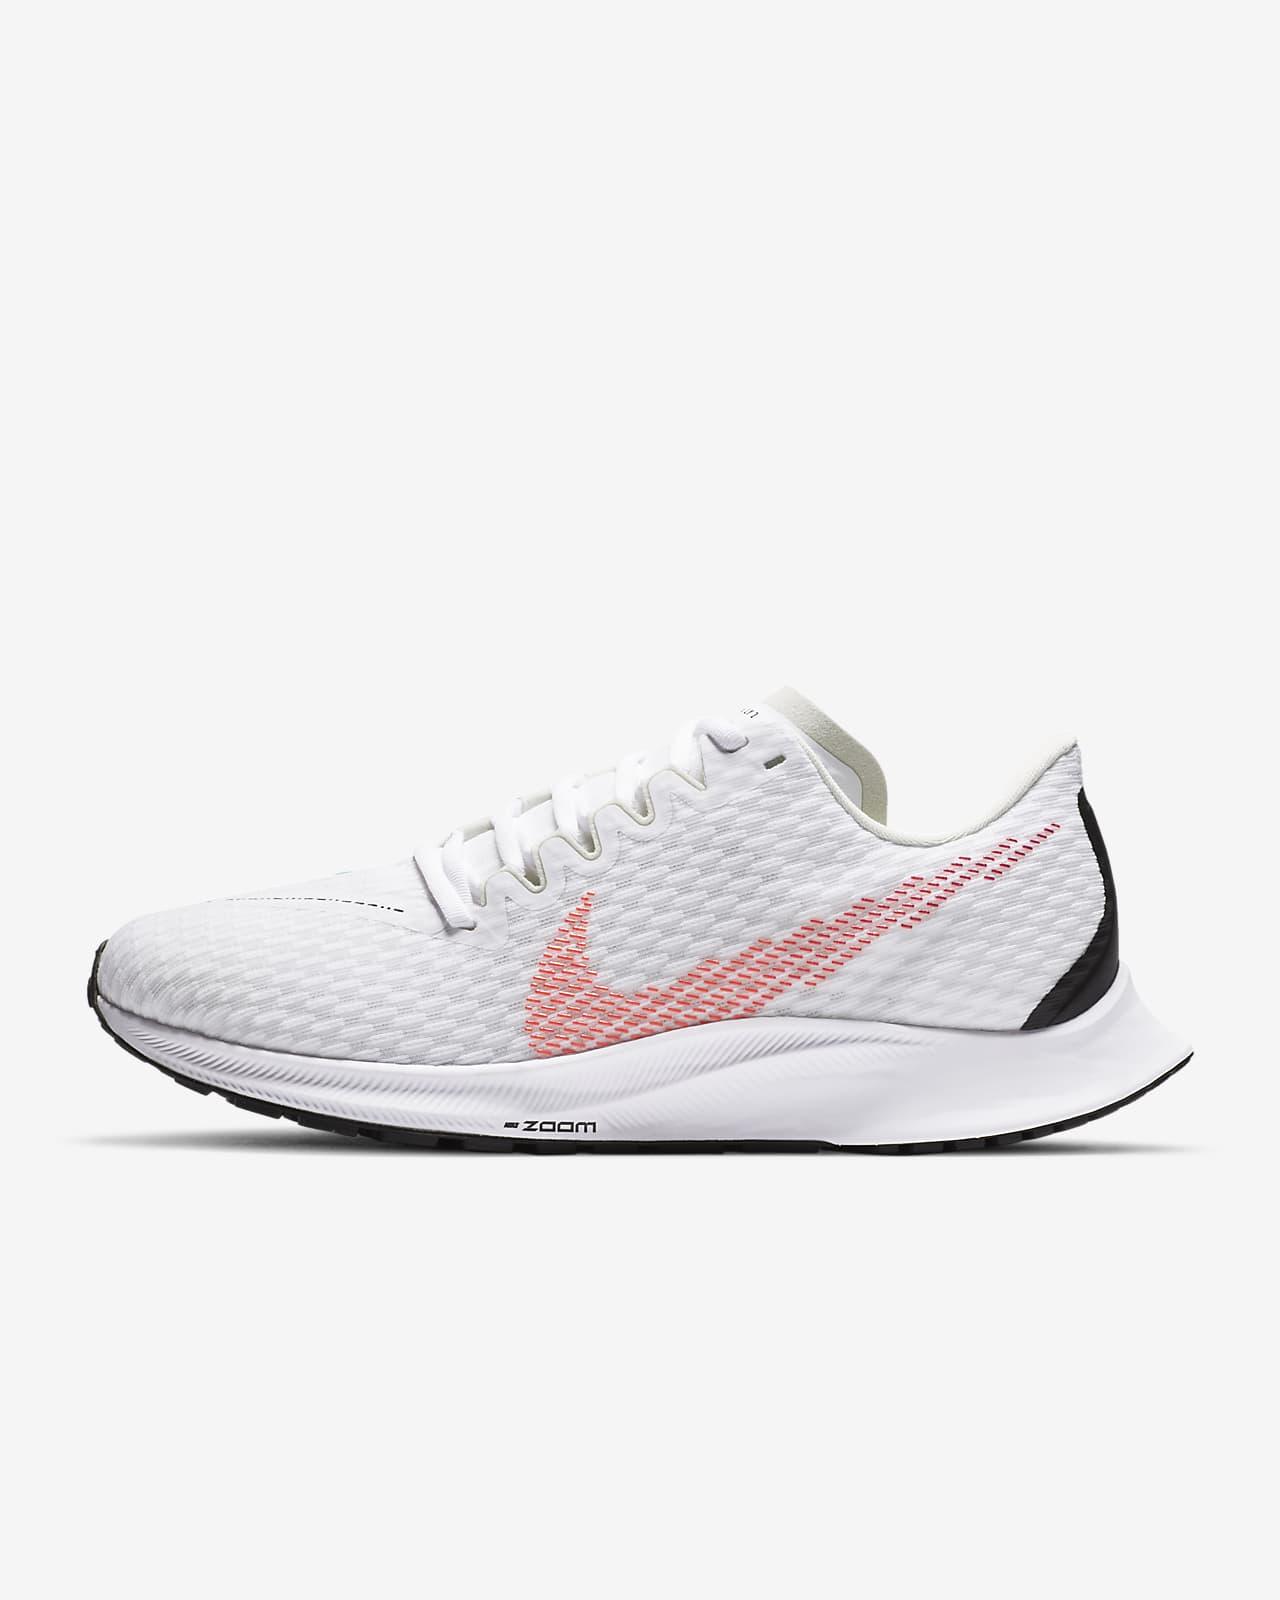 Nike Zoom Rival Fly 2 Women's Running